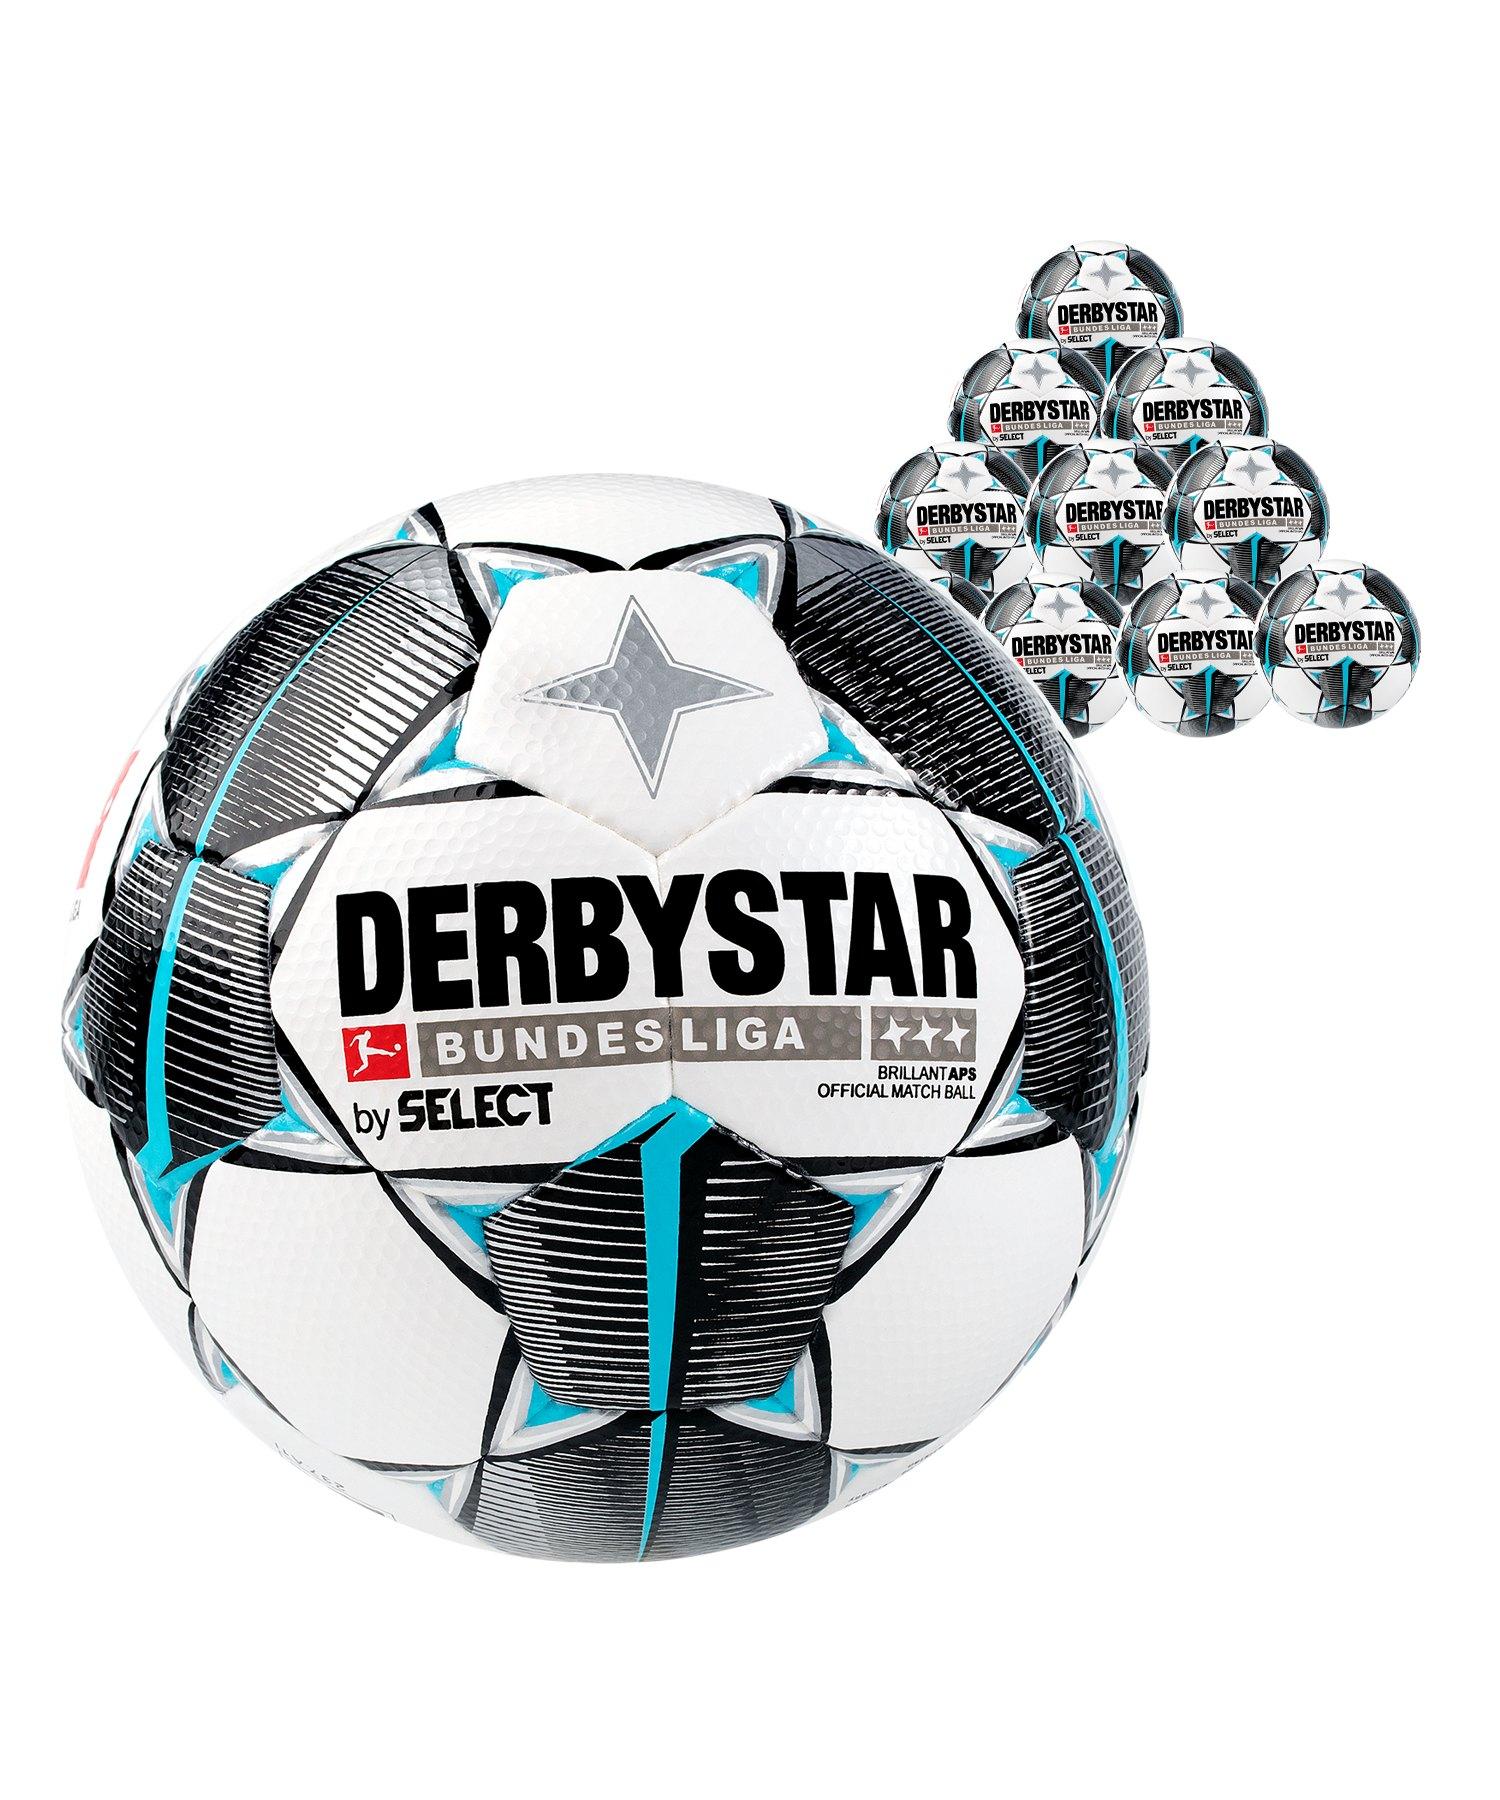 Derbystar Buli Bril APS Spielball 10x Gr.5 Weiss F019 - weiss